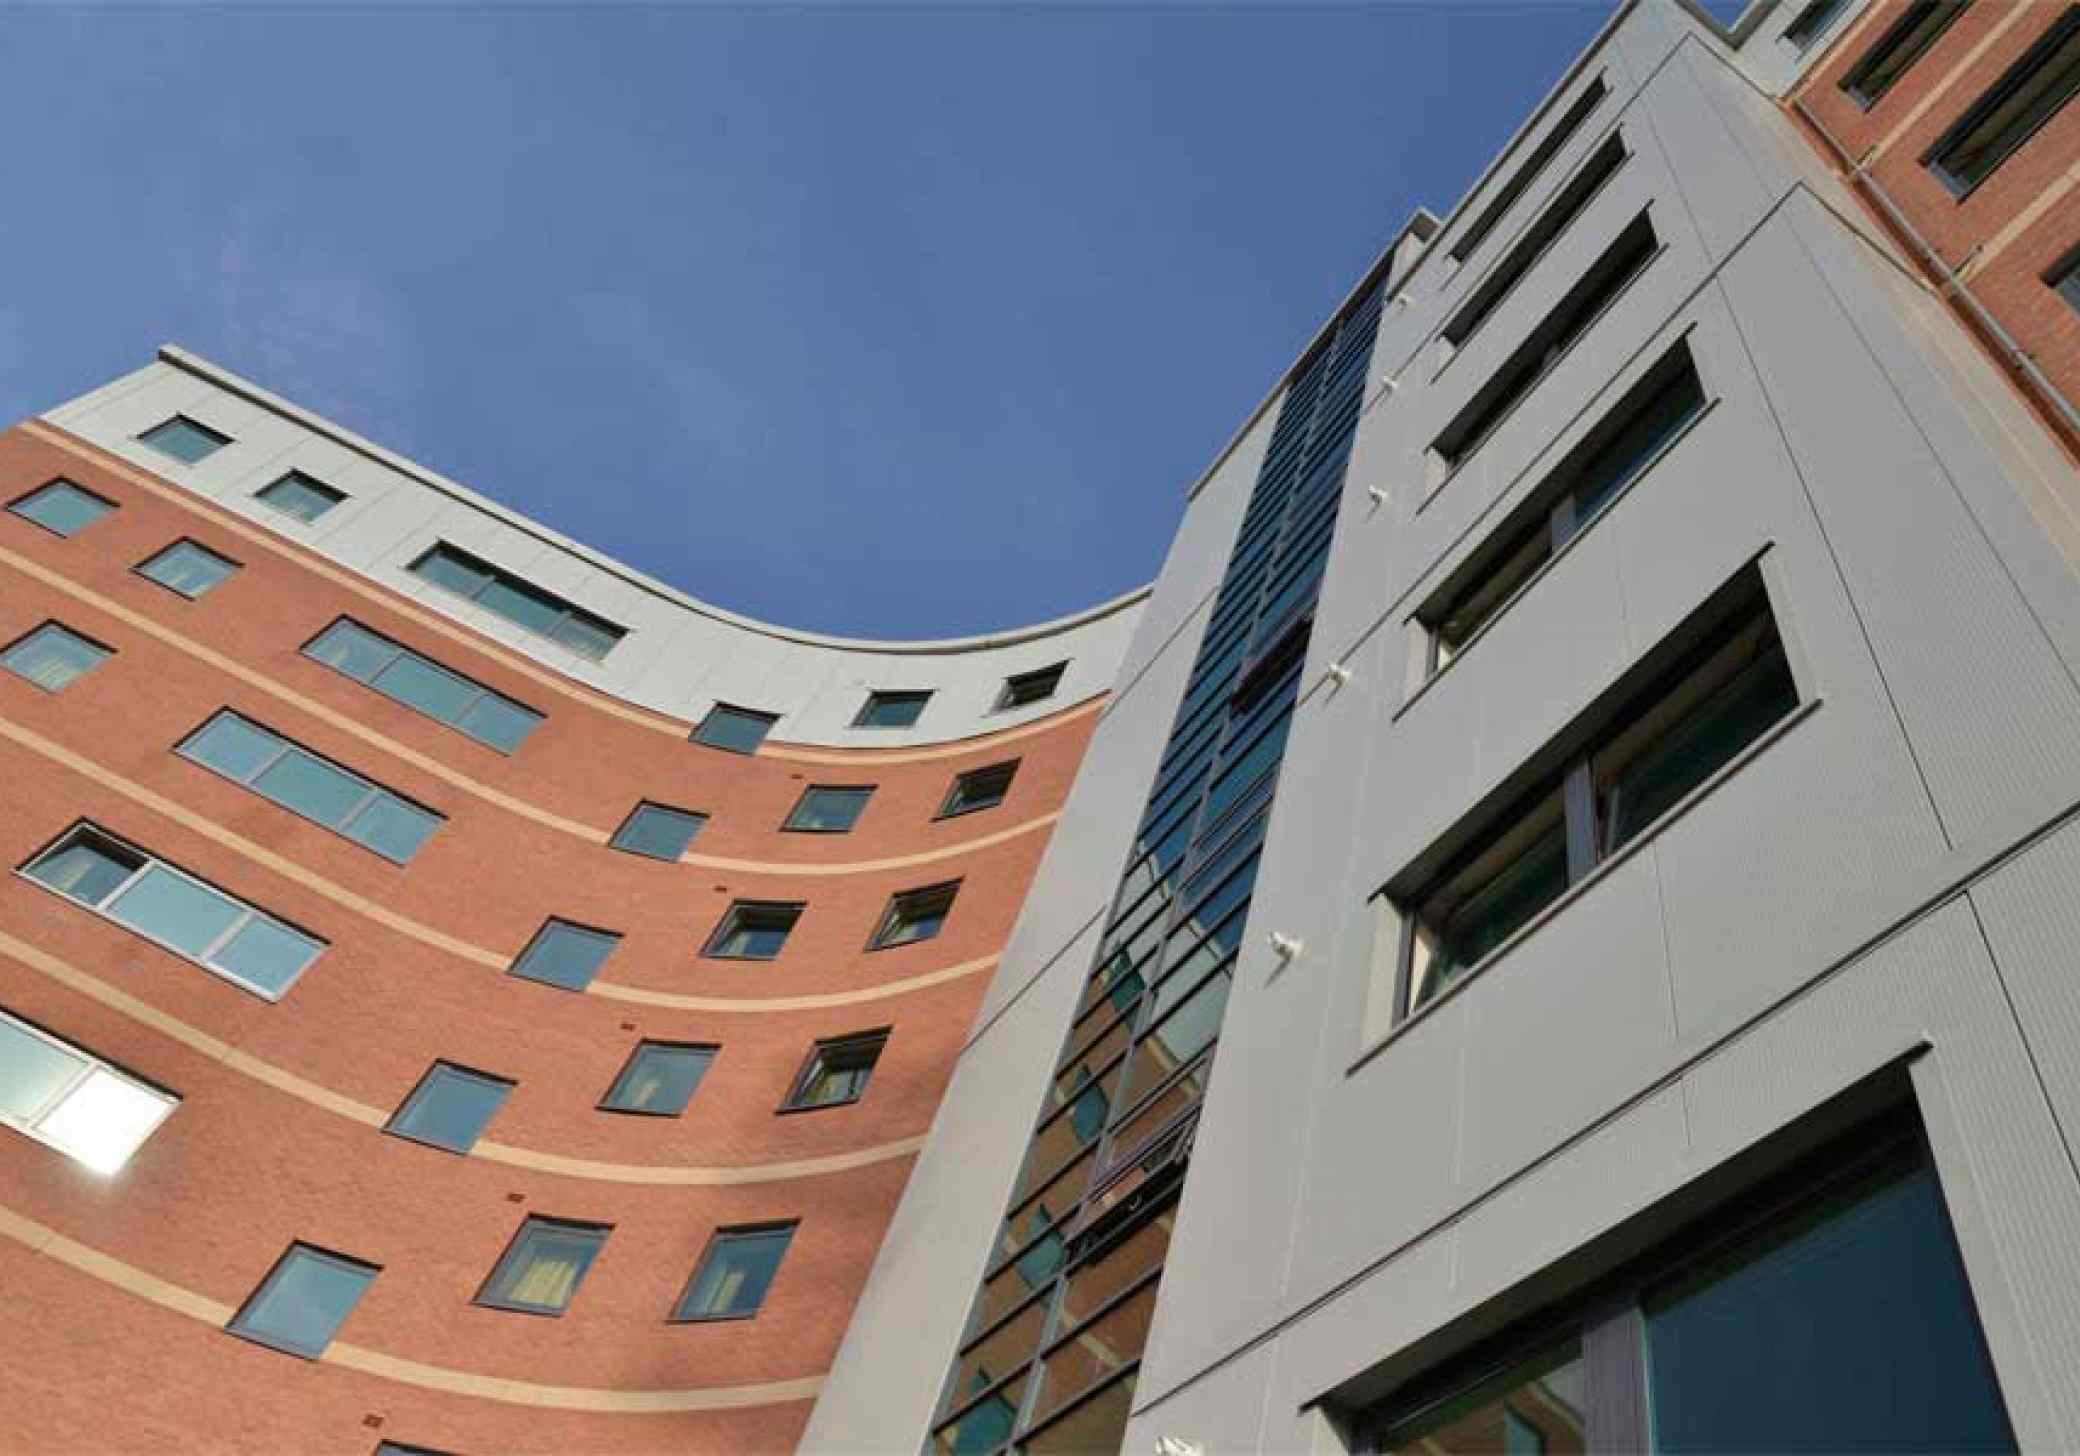 Wrexham Student Village buildings finish